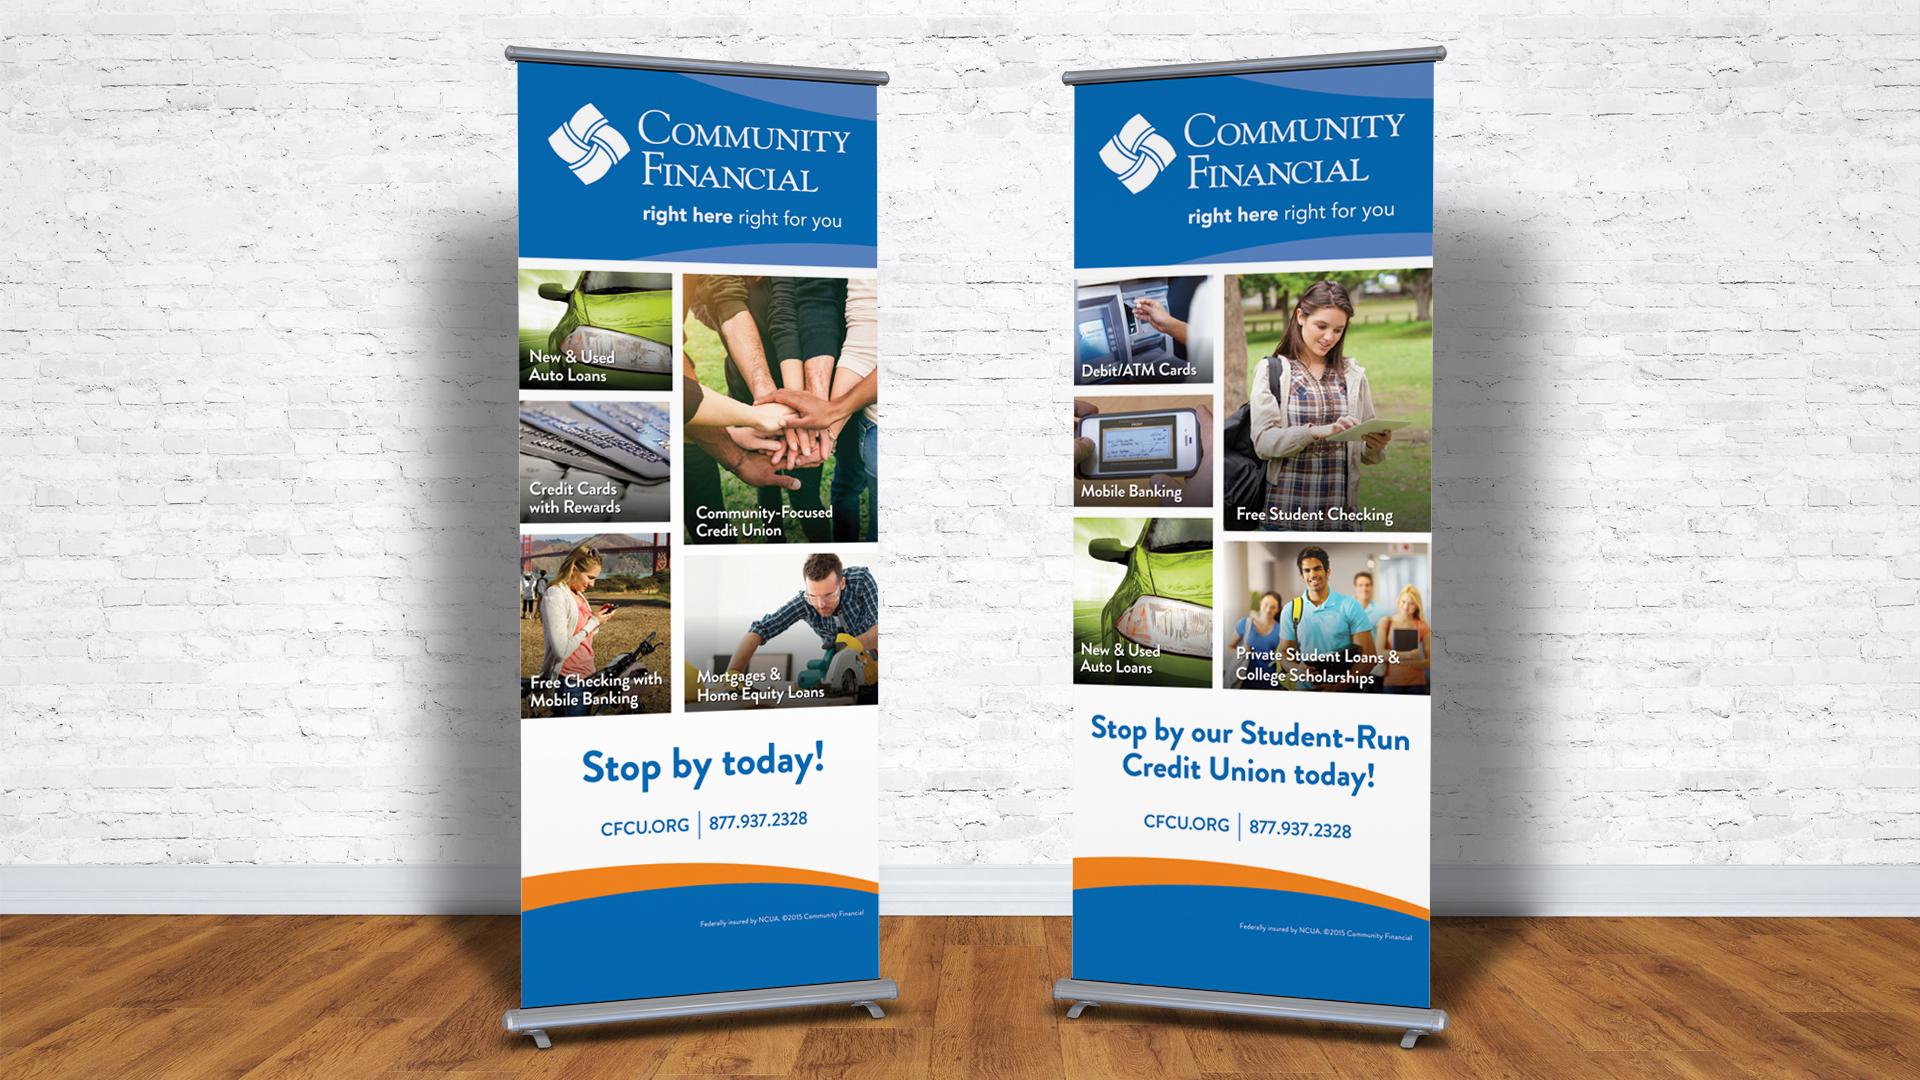 Community Financial Rollup Banners   The Brainwerks